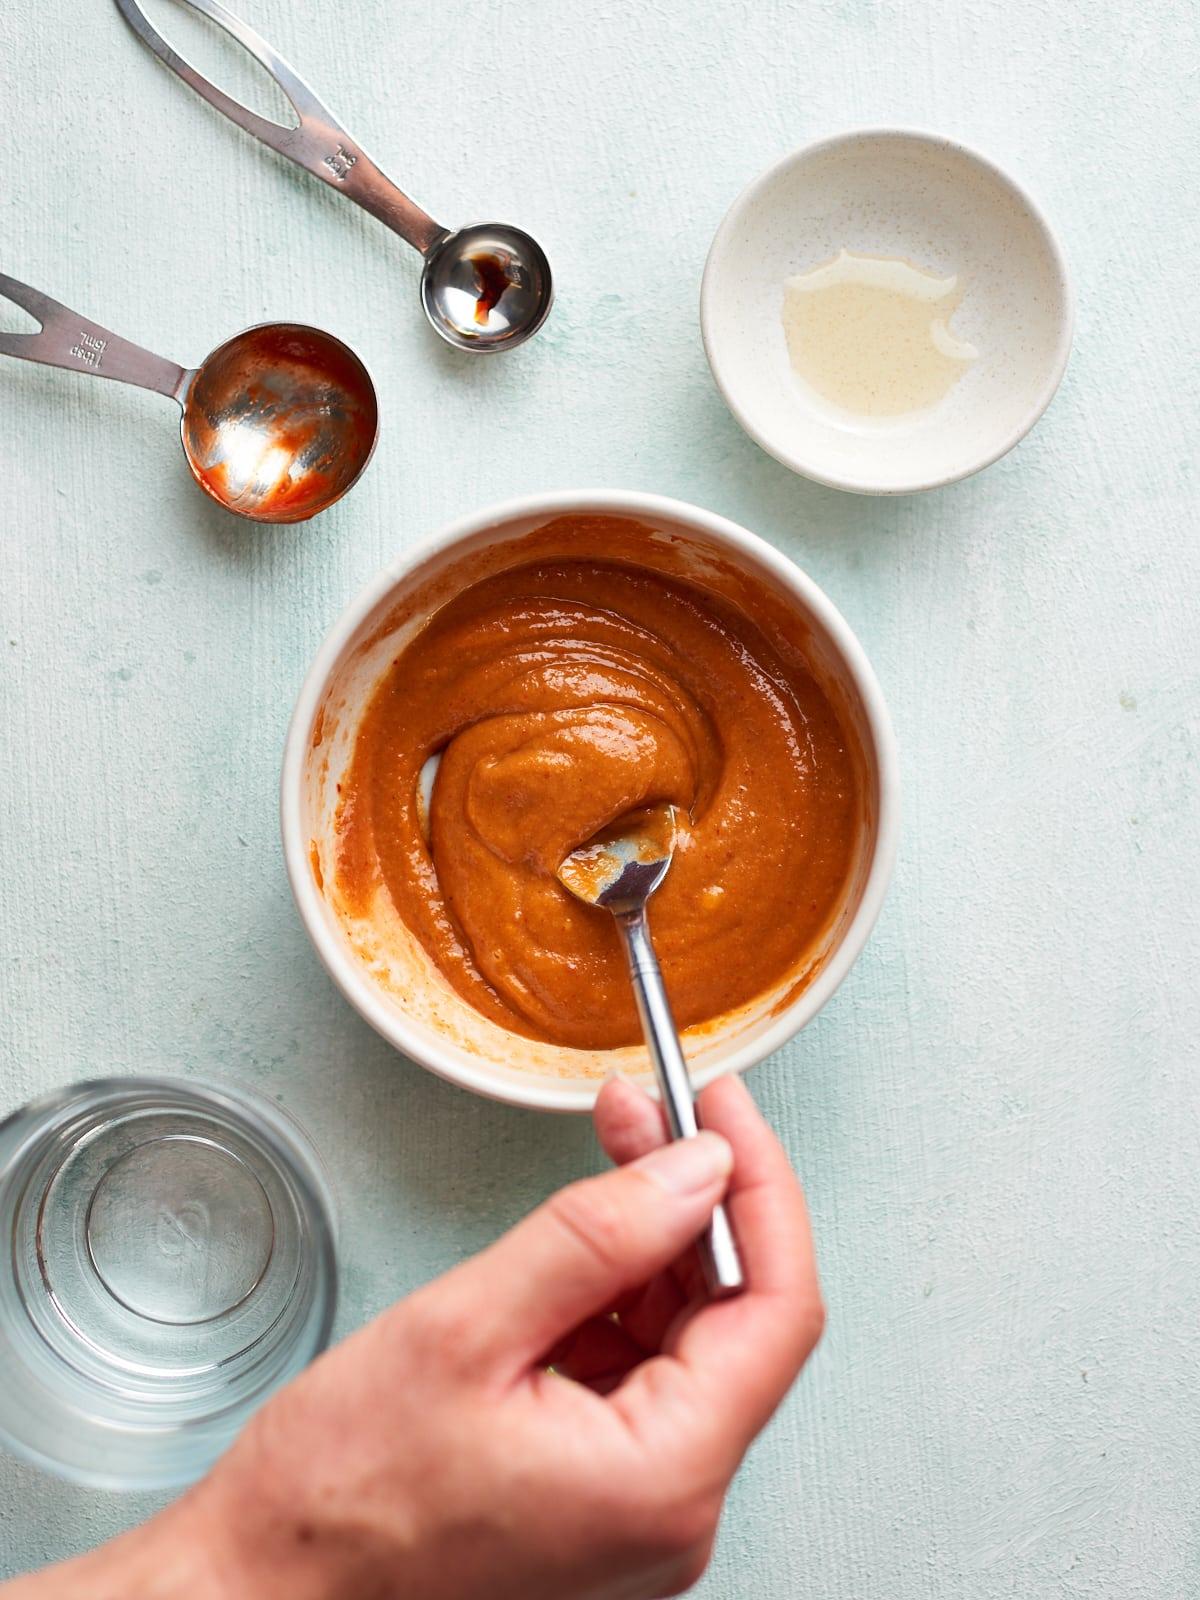 Stirring the tahini sauce